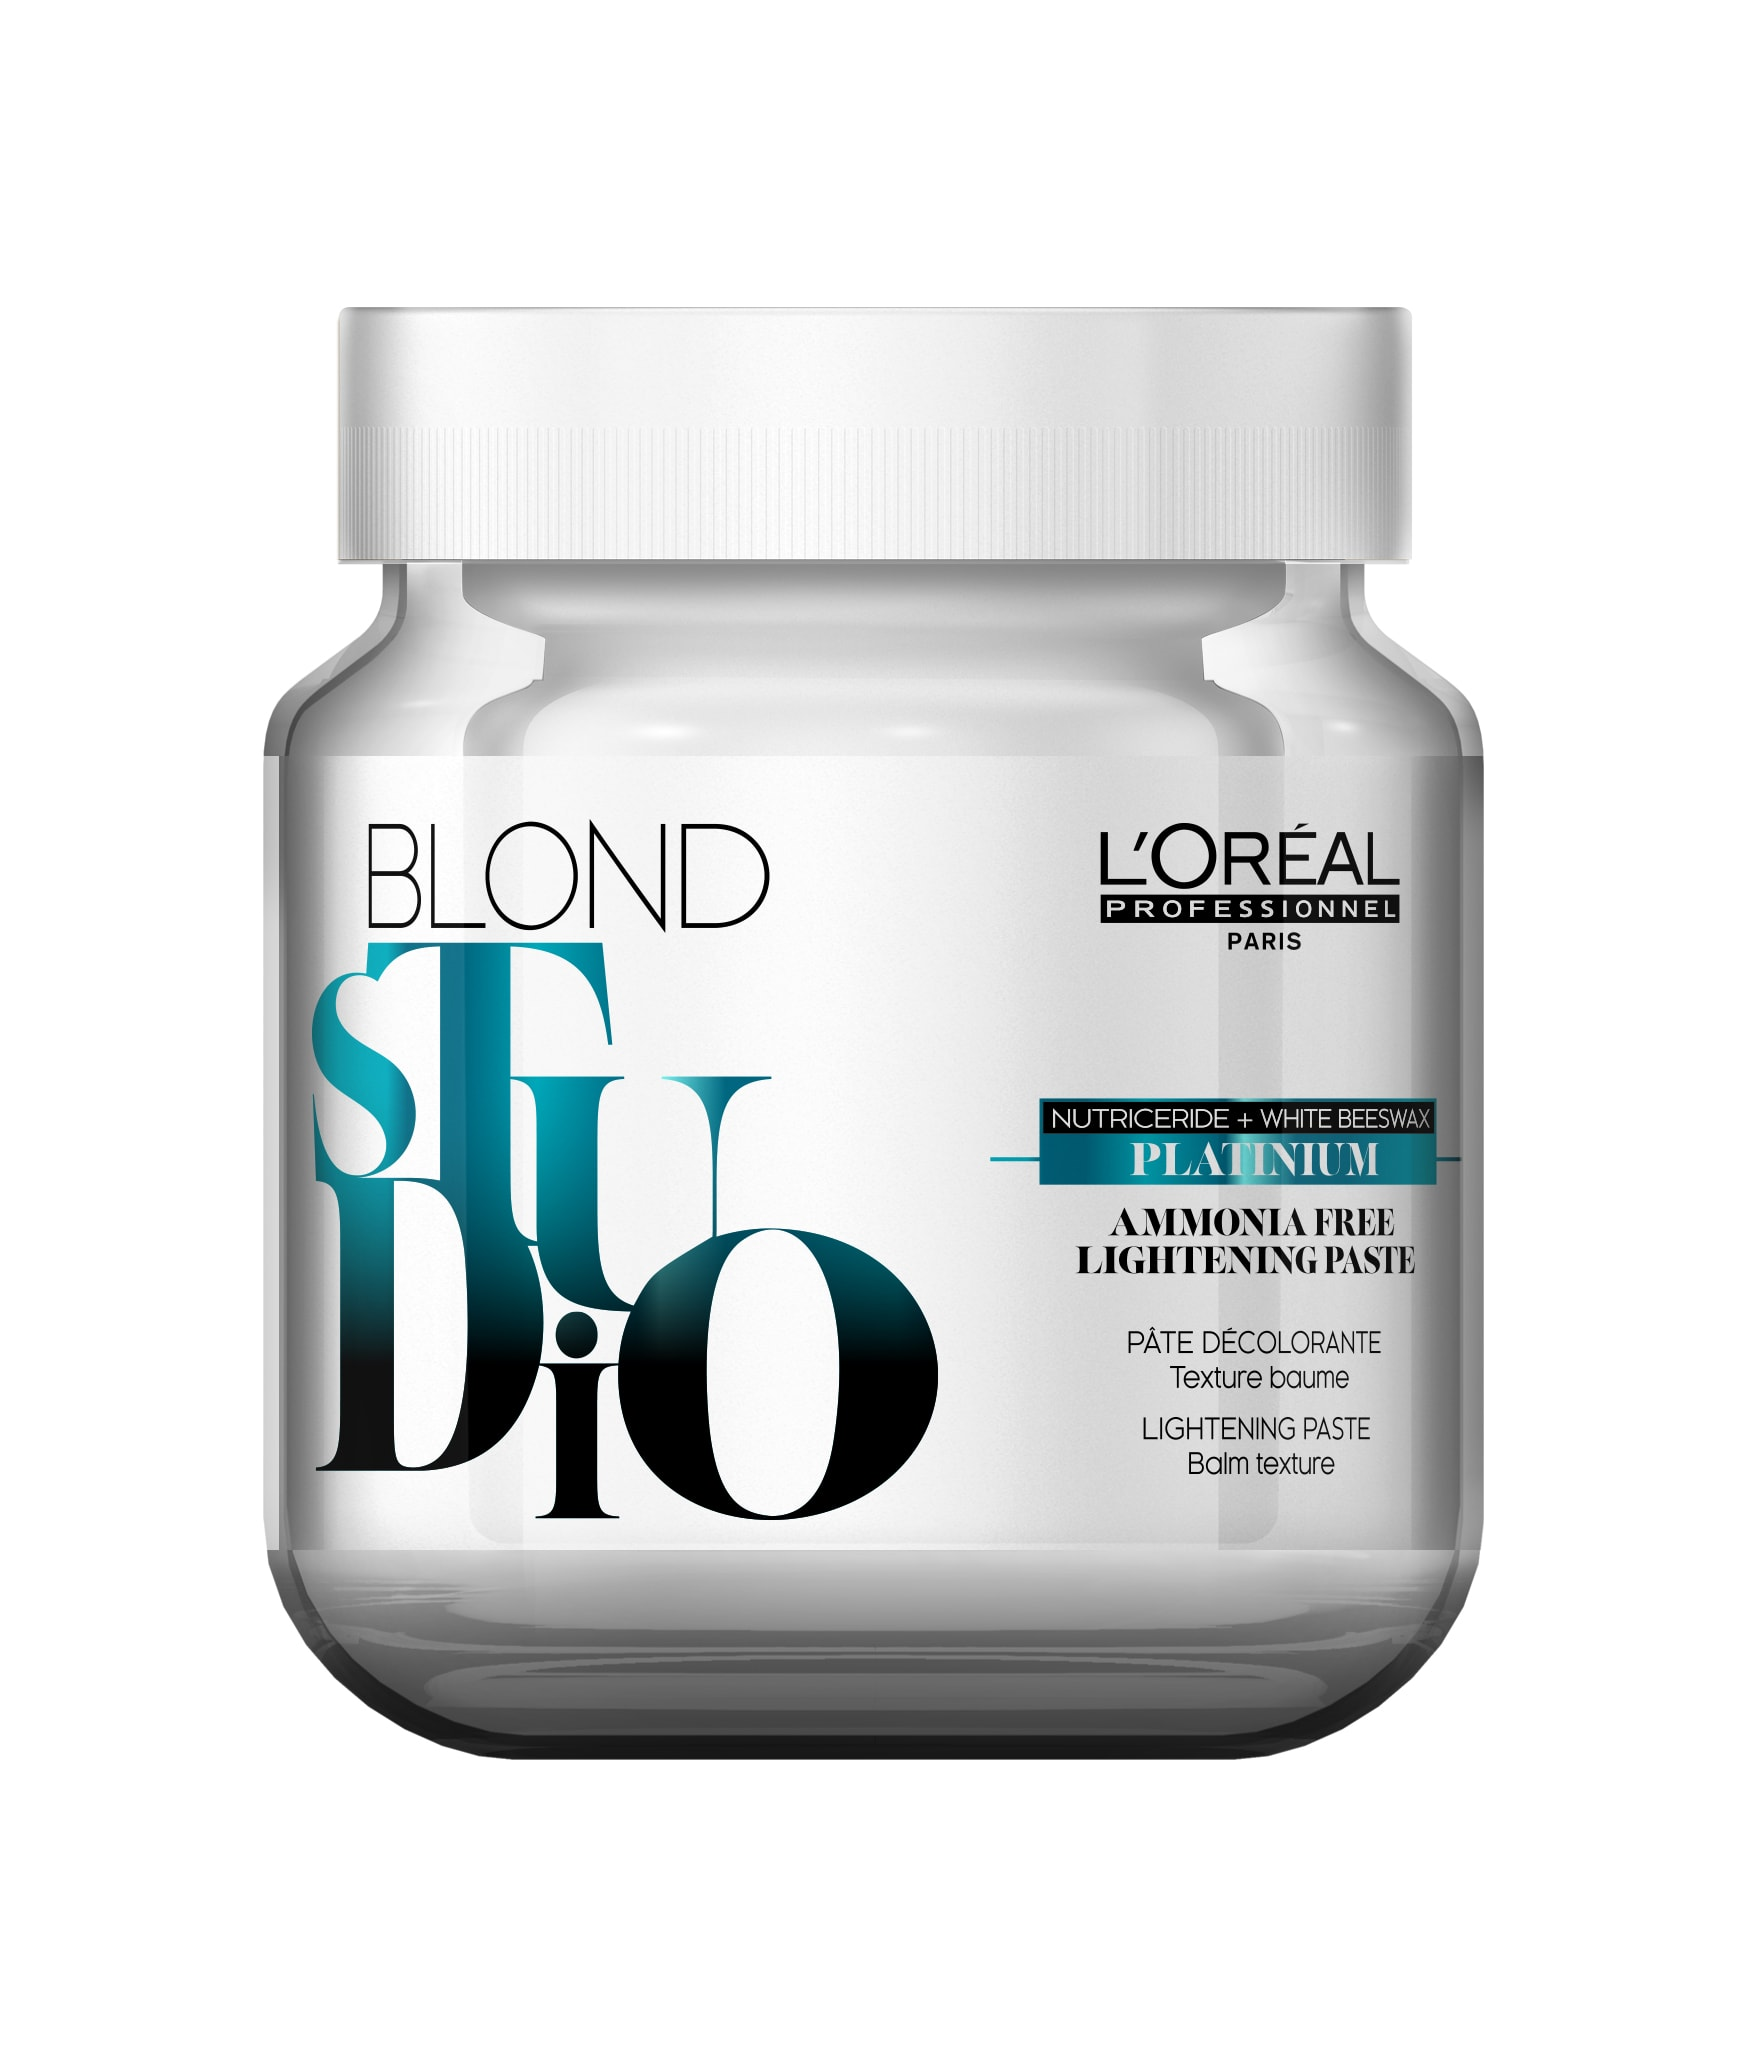 L'Oreal Blond Studio Platinum Bleach 400g